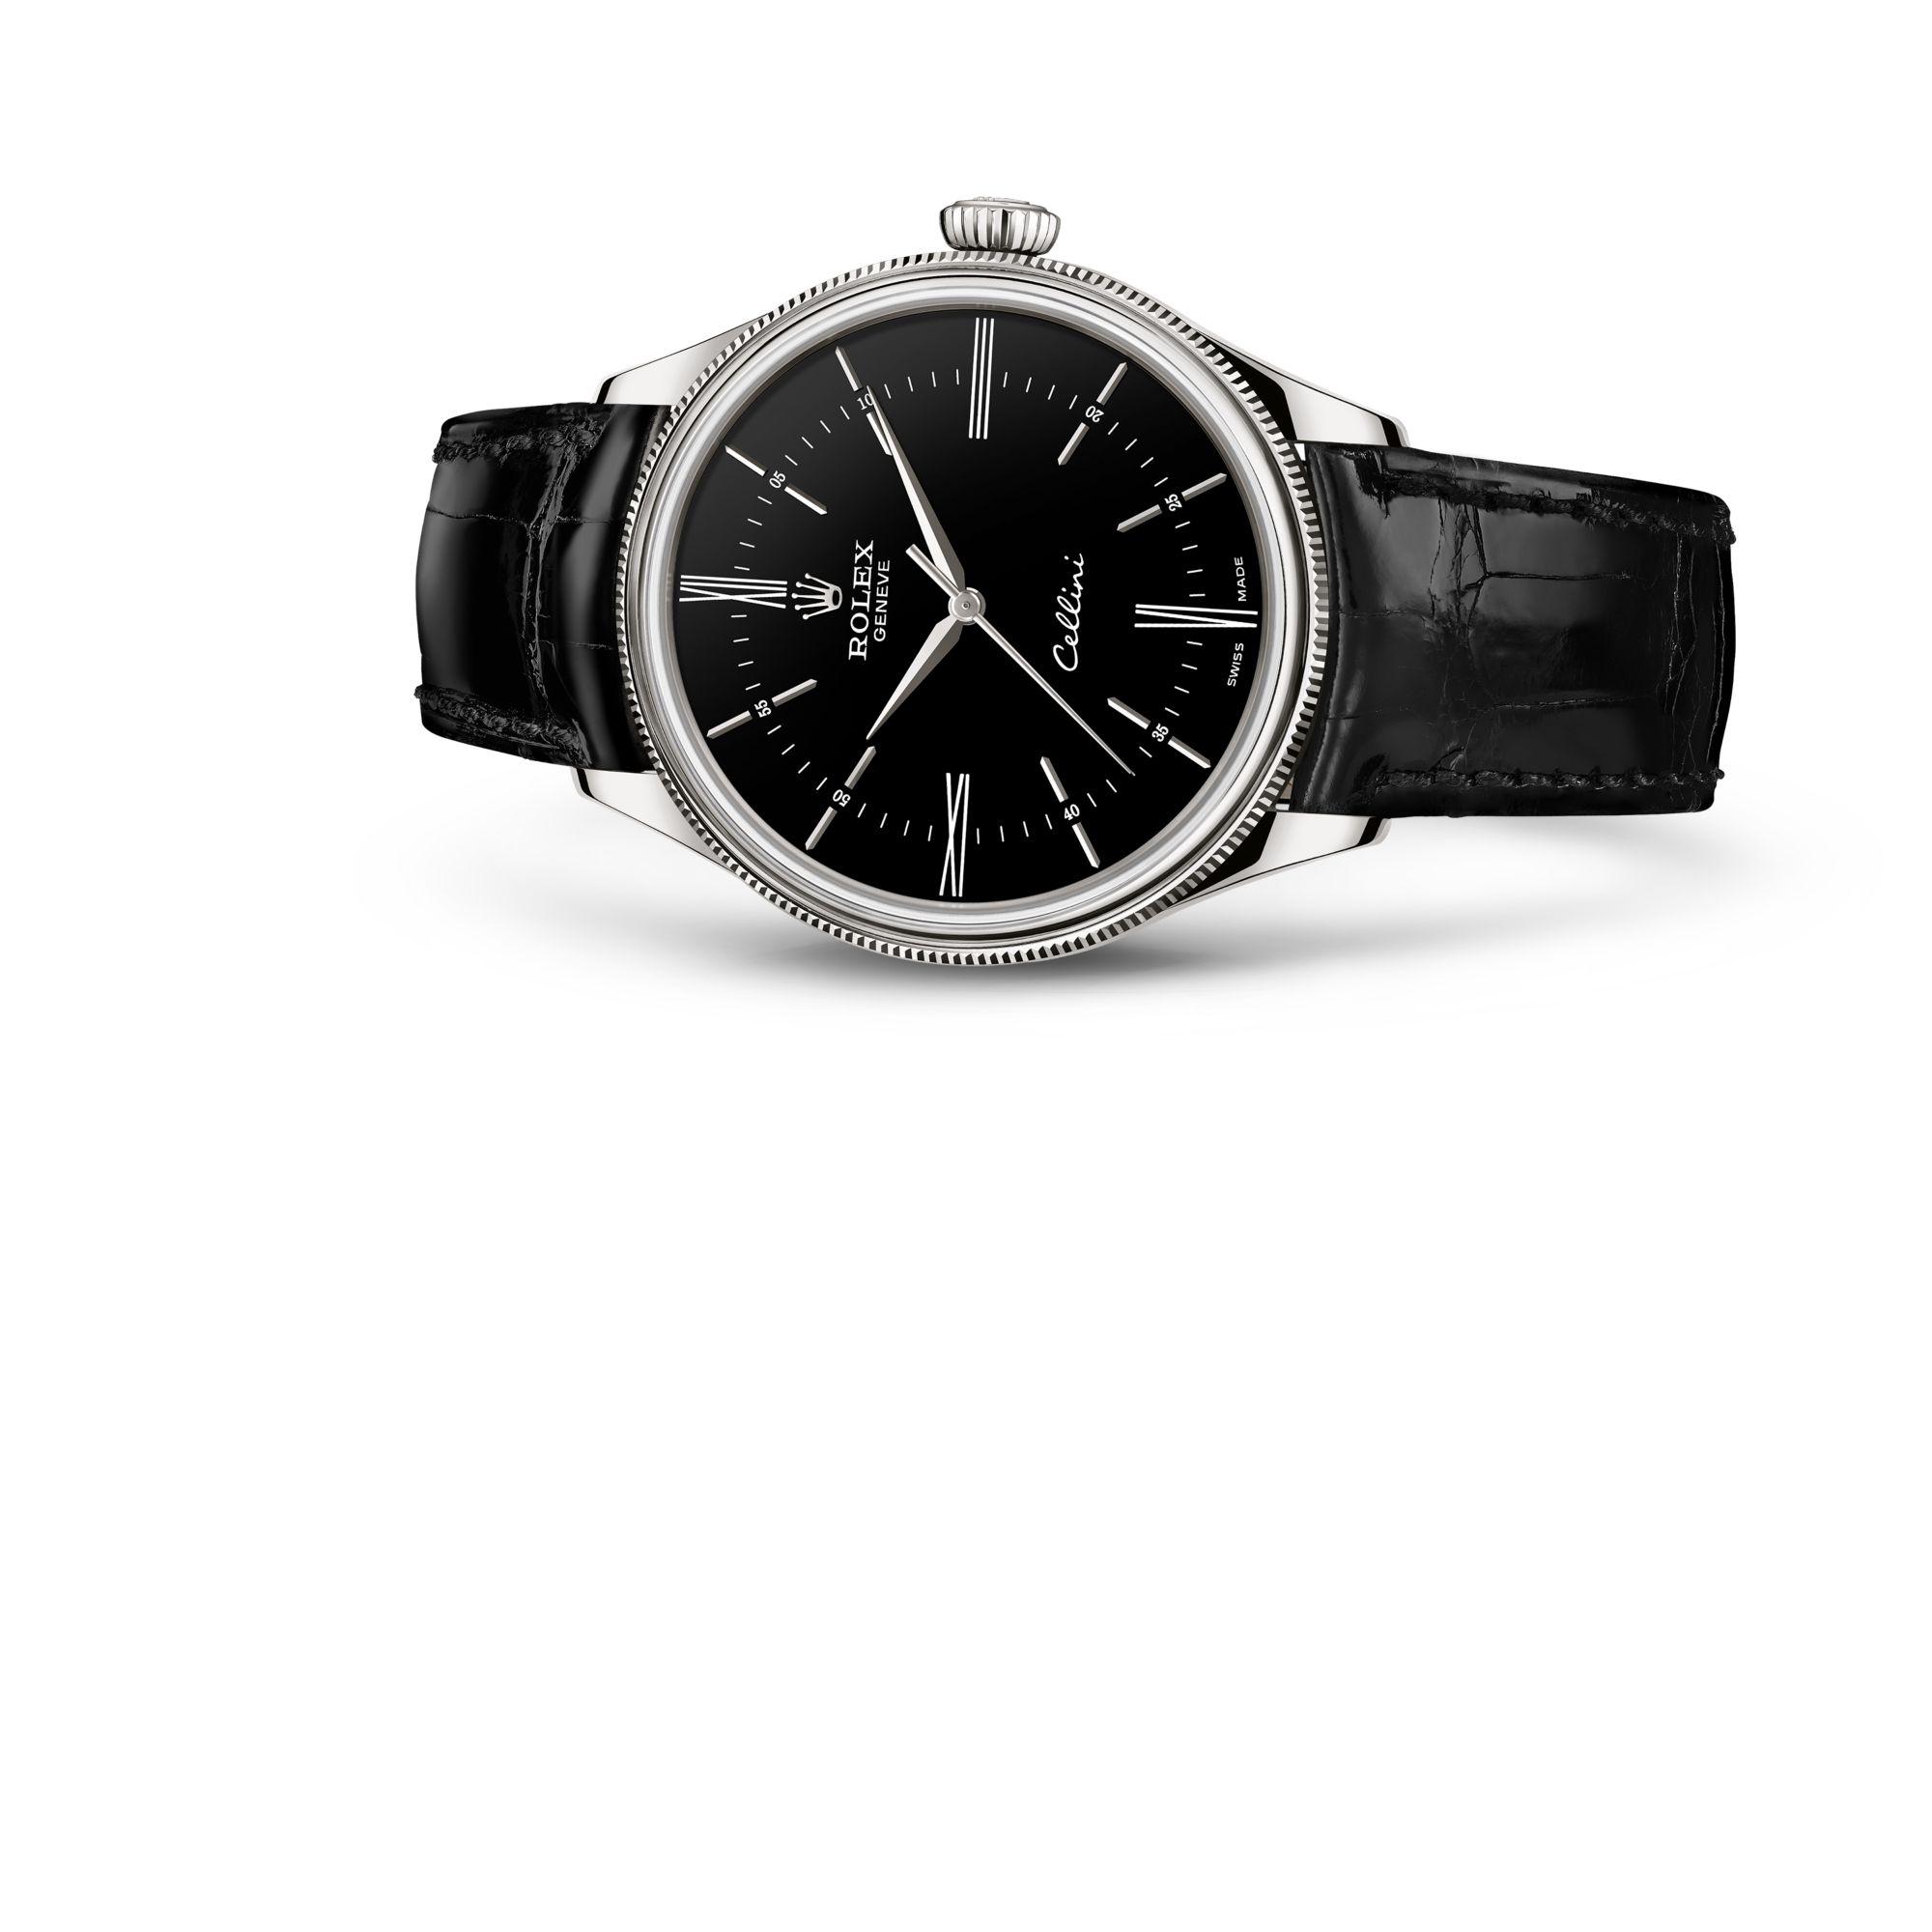 Rolex チェリーニ タイム M50509-0006